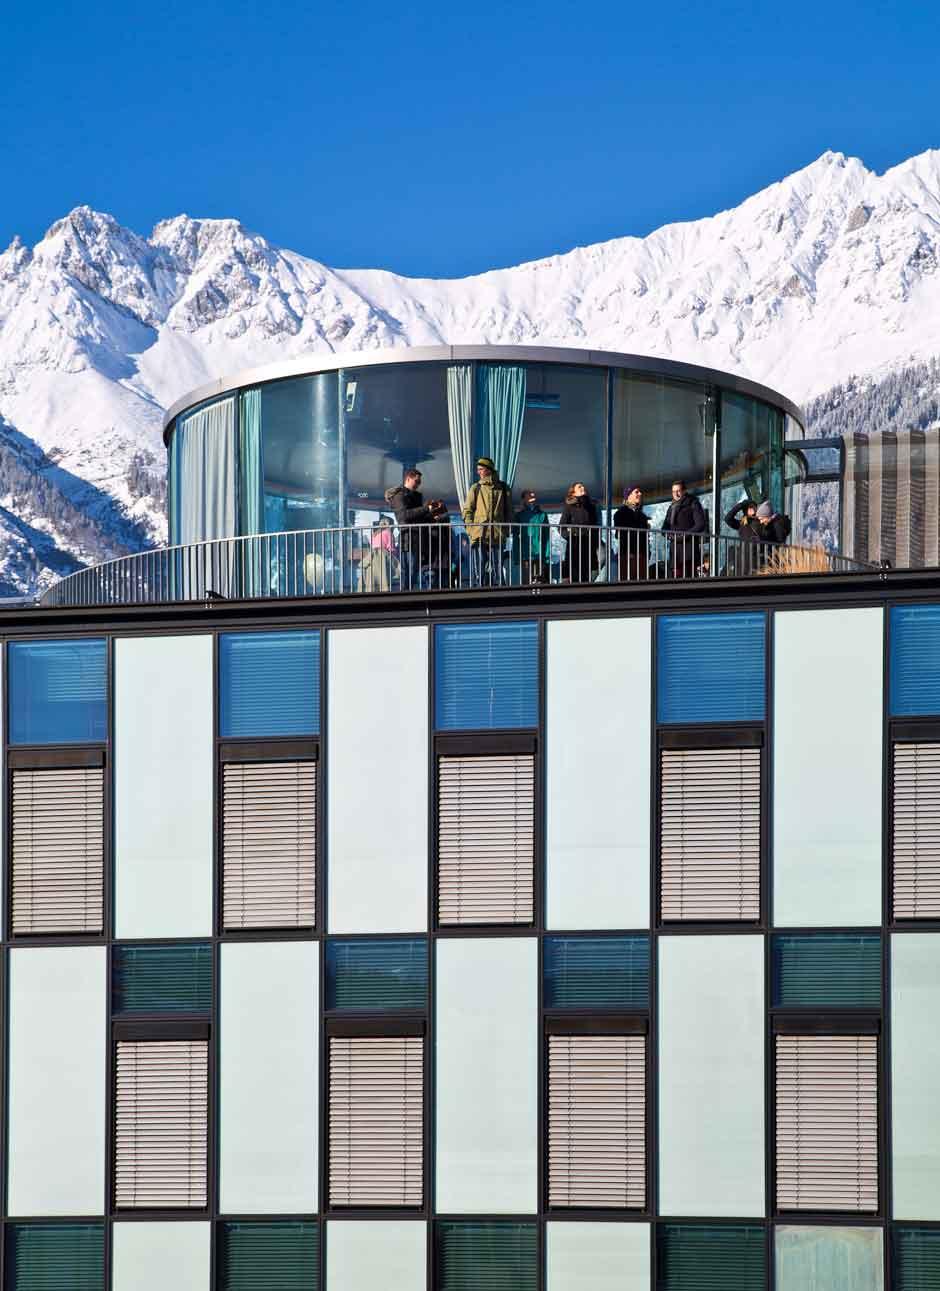 Observatorio de Lichtblick. © Innsbruck Tourismus / Christof Lackner